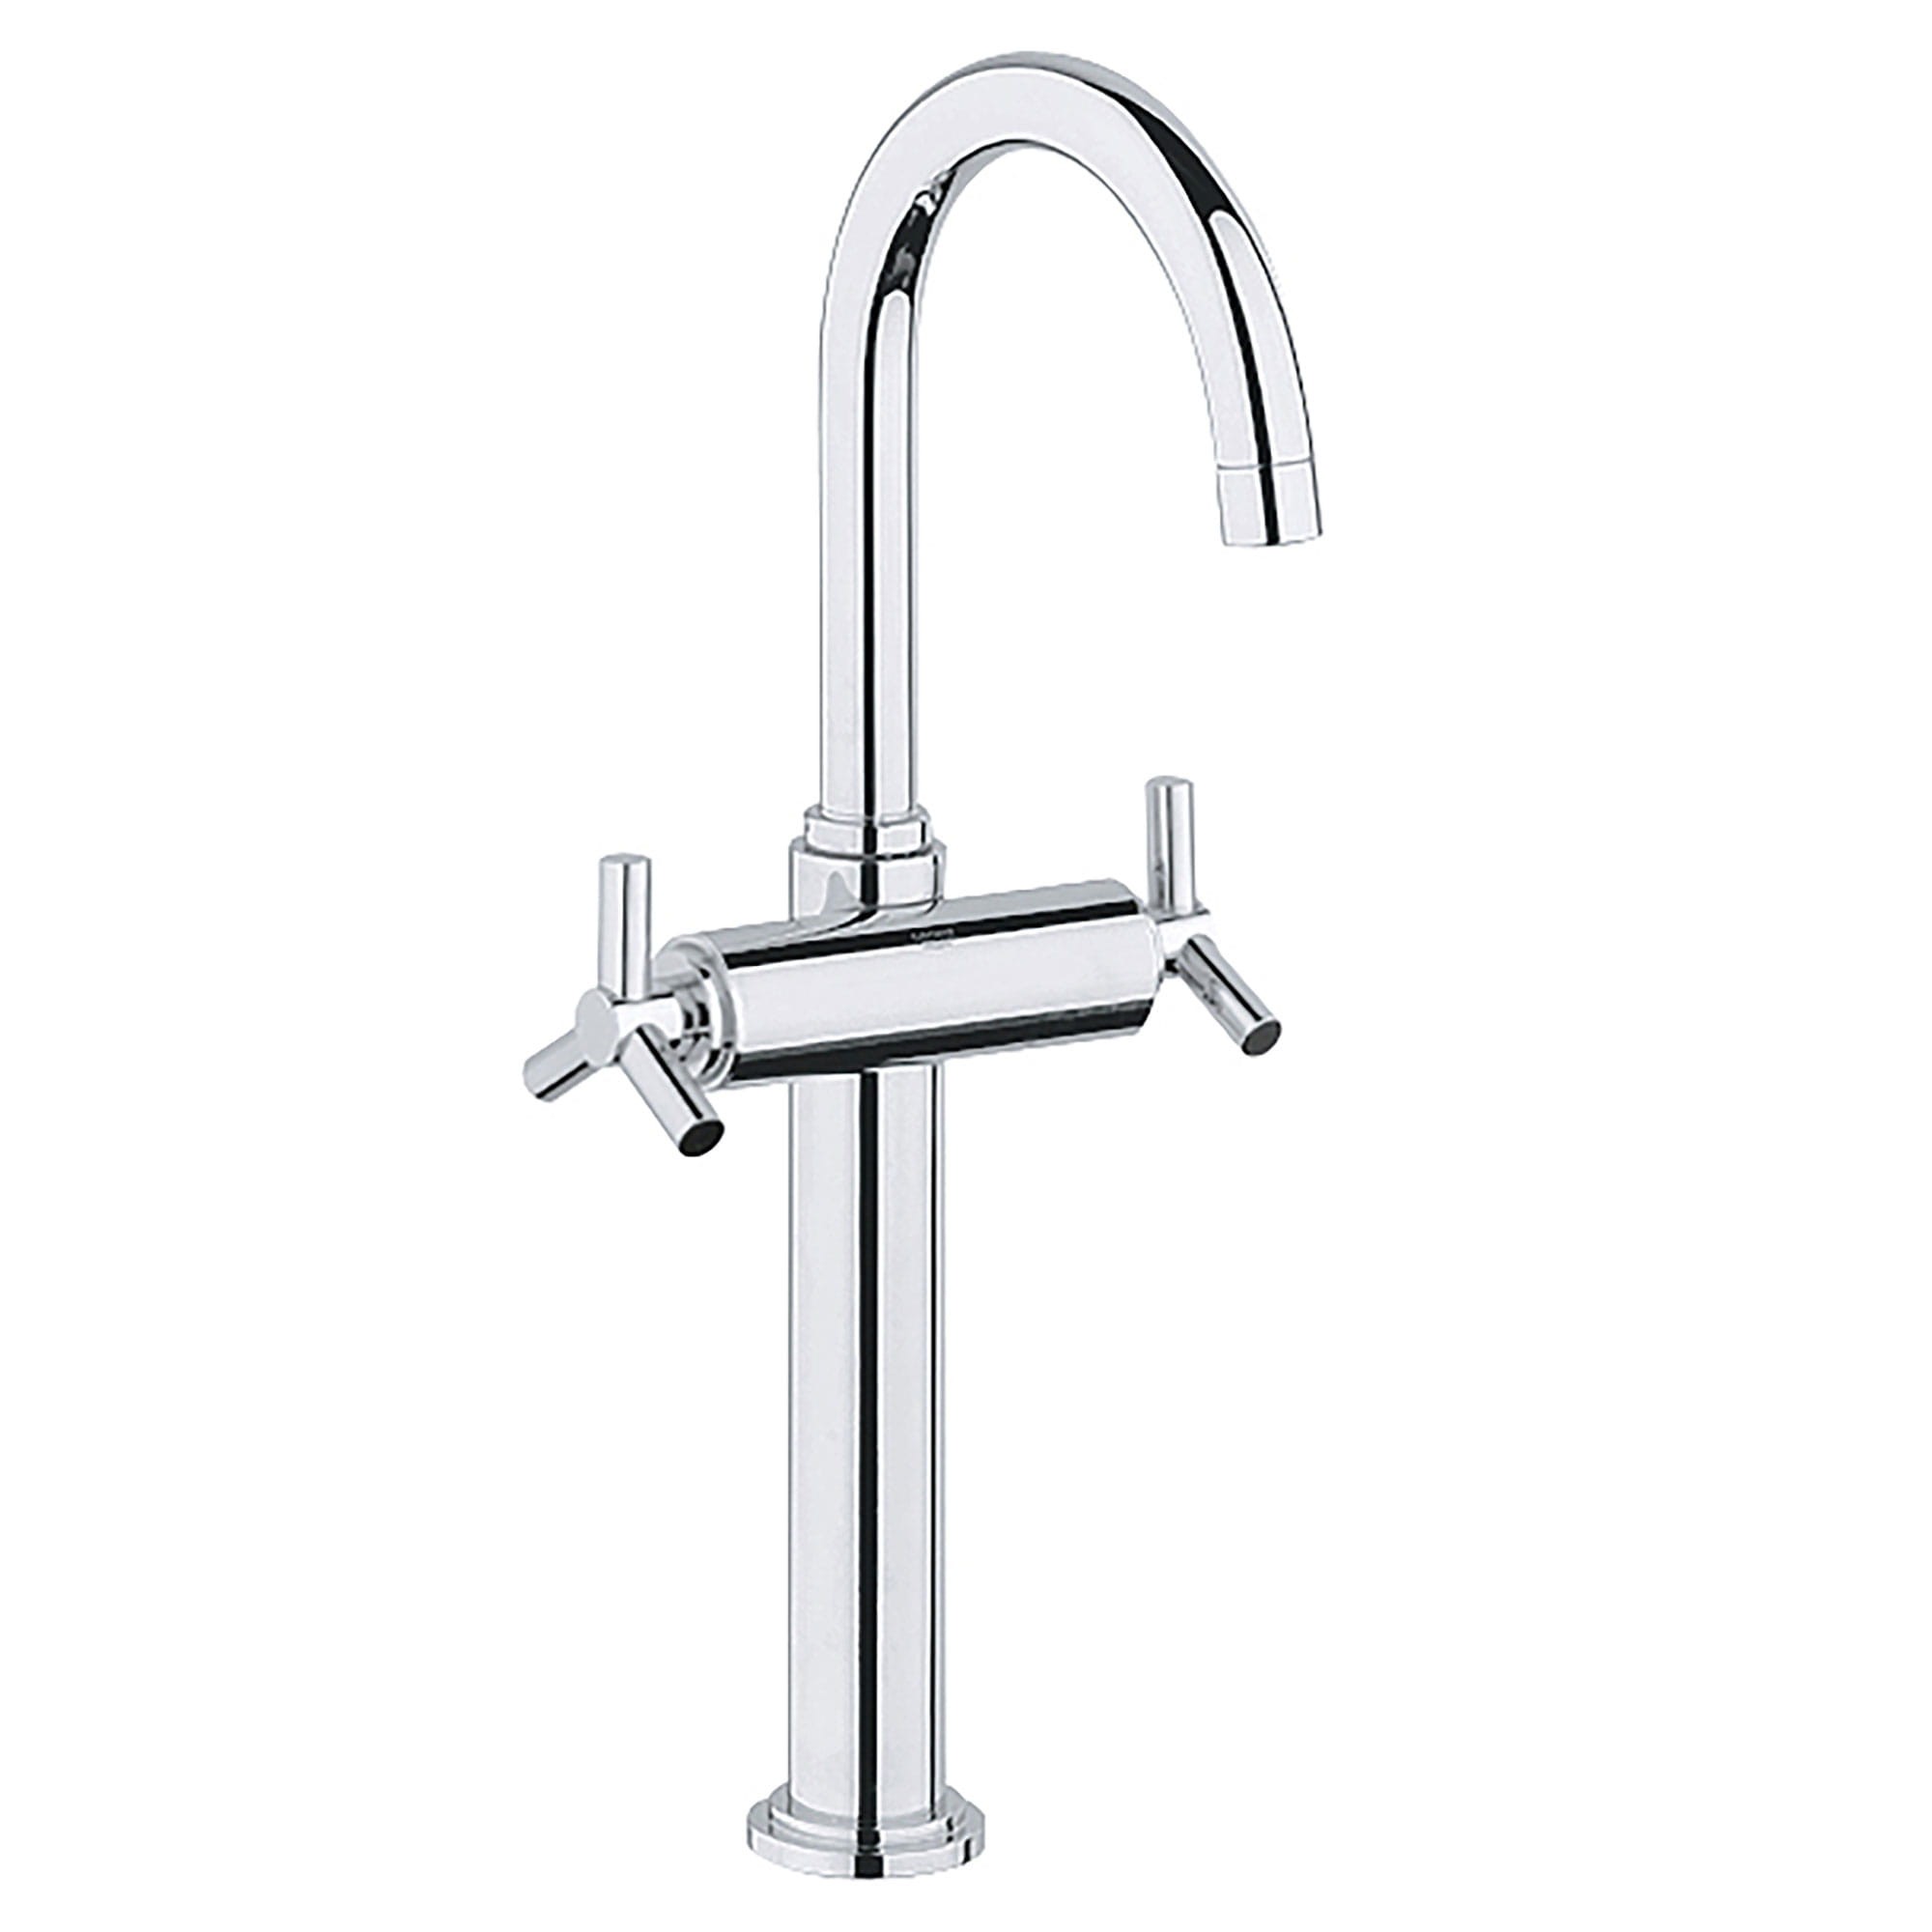 single hole 2 handle deck mount vessel sink faucet 1 2 gpm